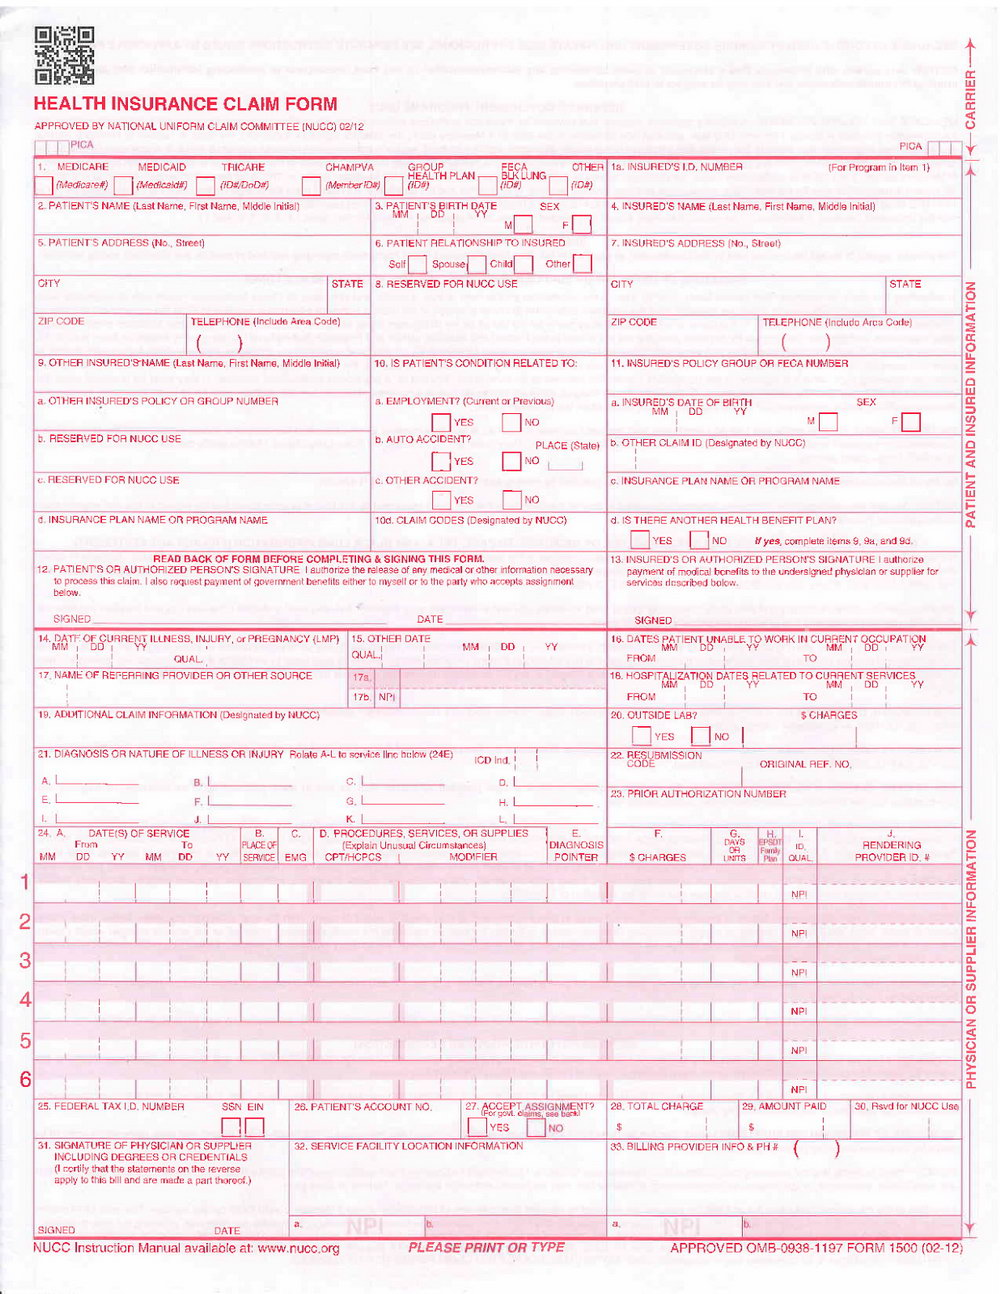 Hcfa Form 1500